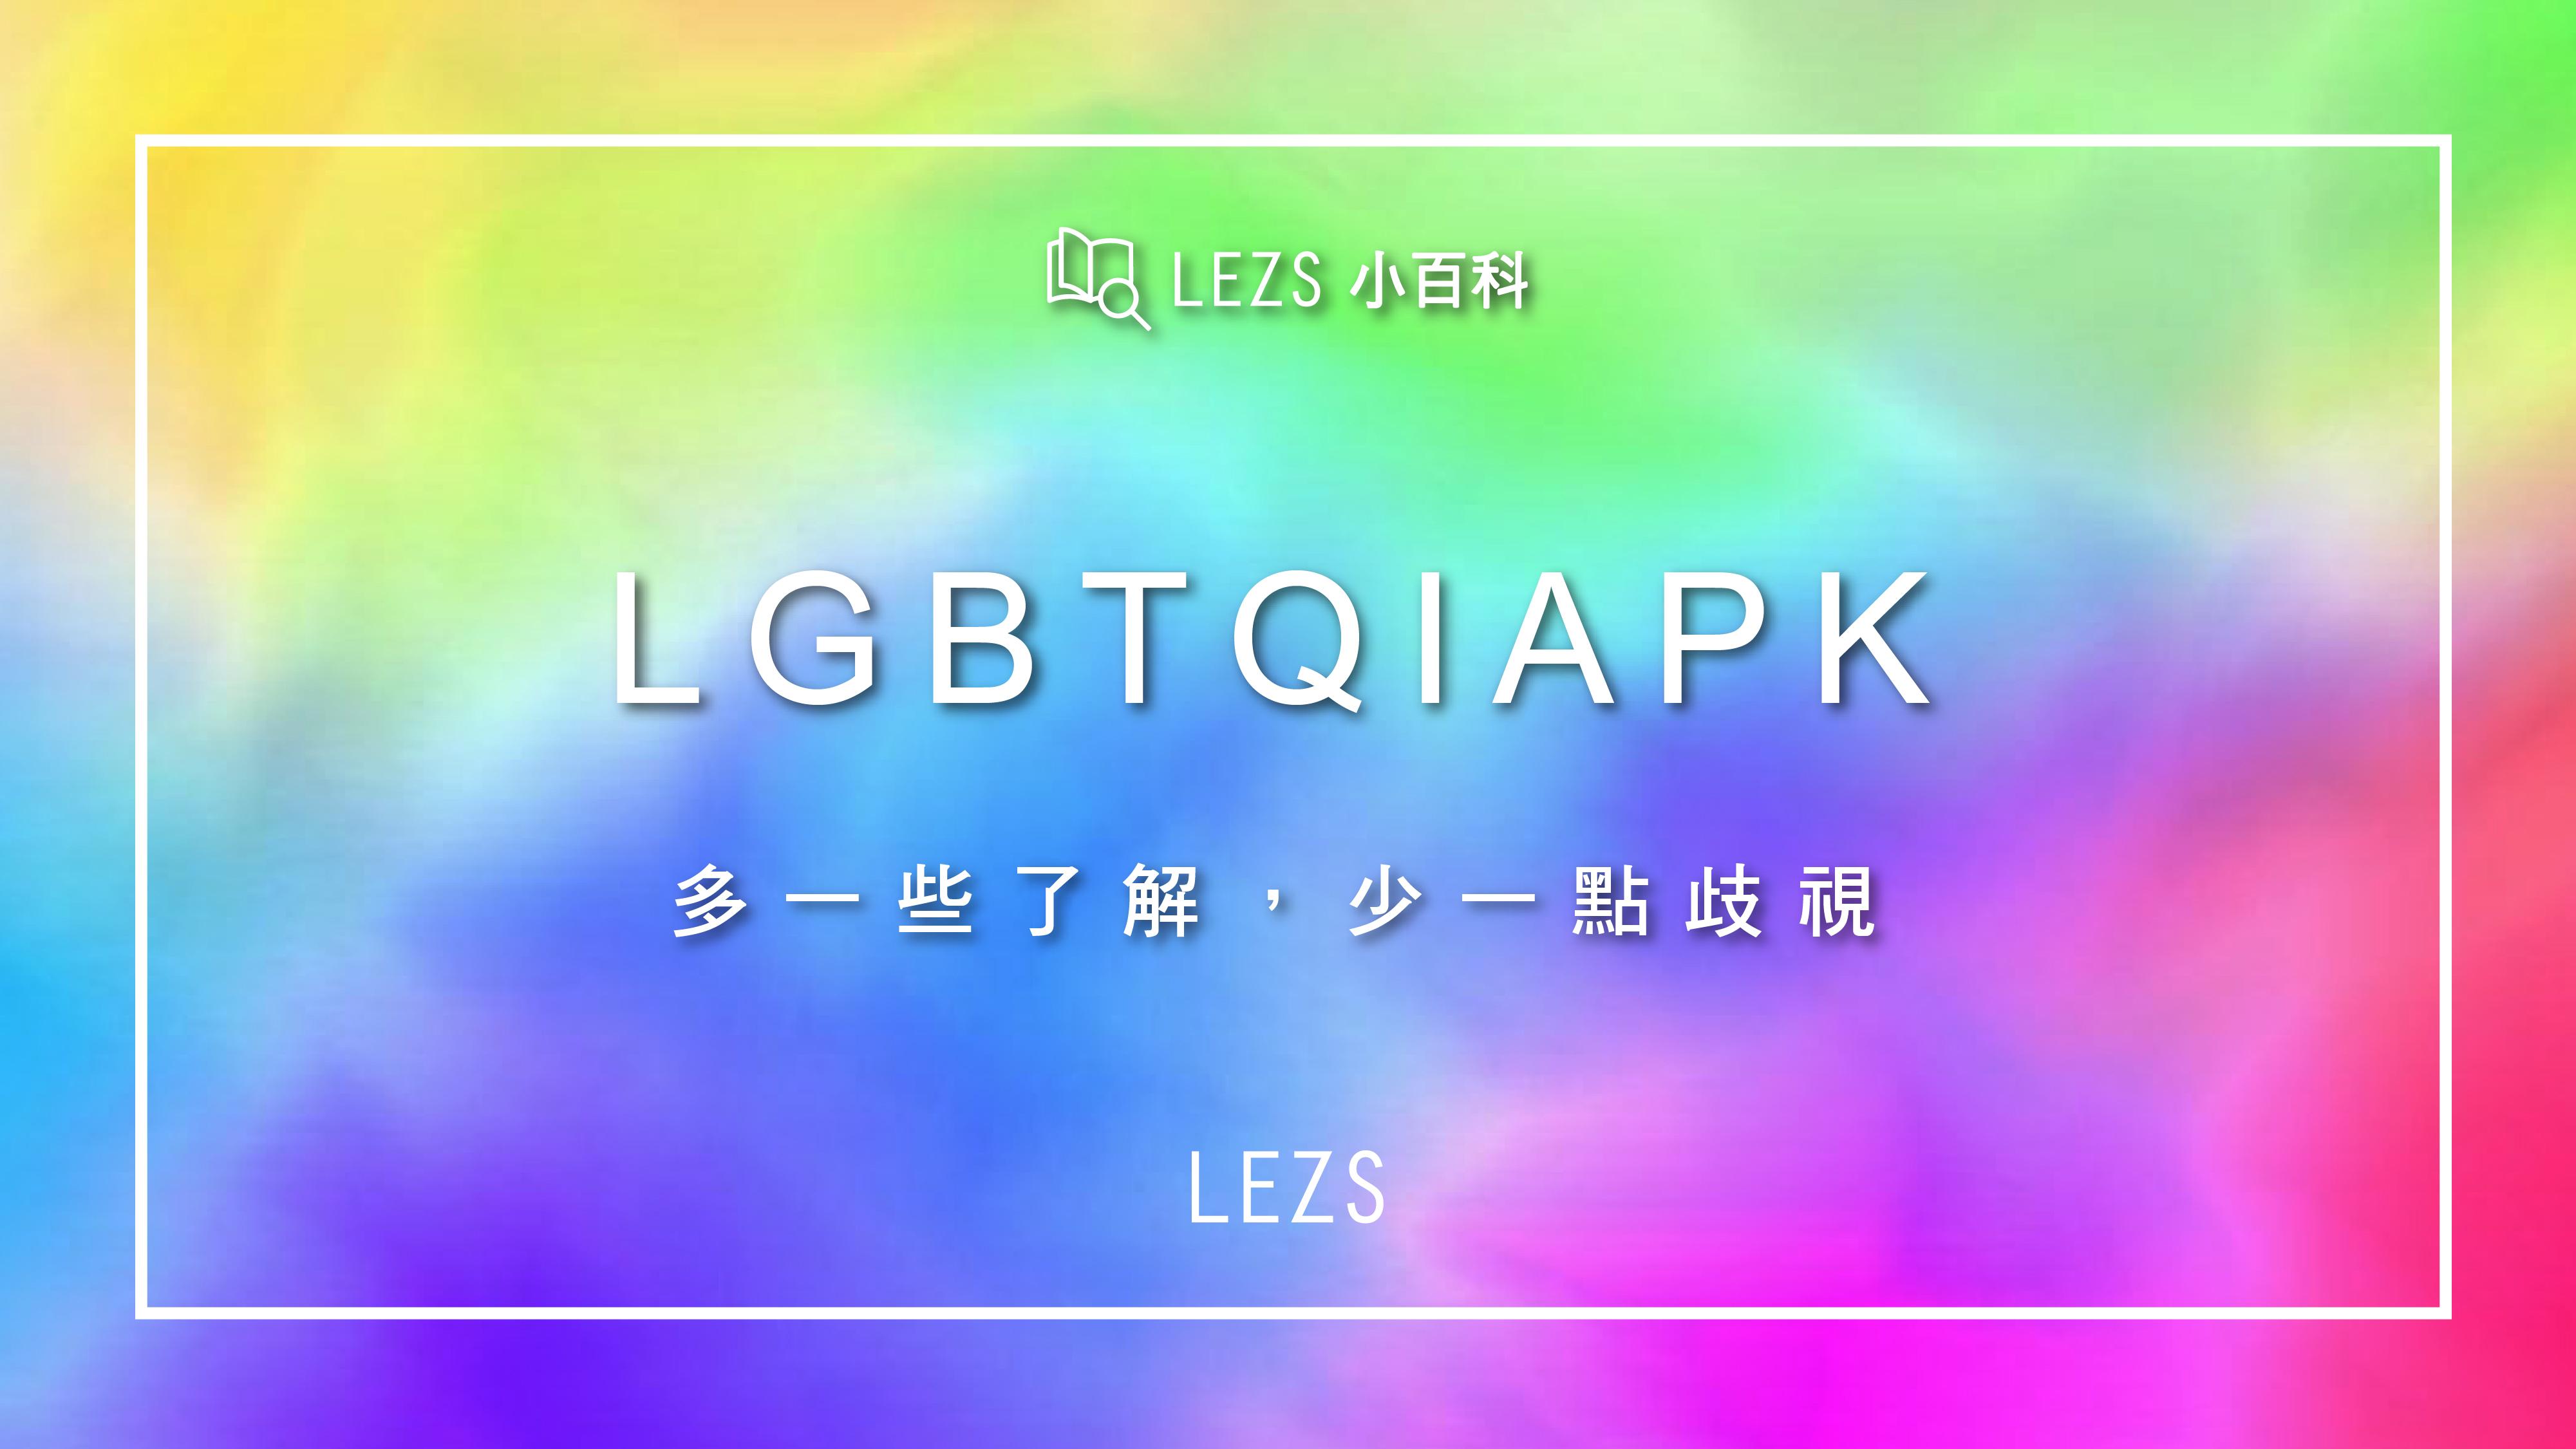 LGBTQIAPK?那些越來越多的英文縮寫到底代表什麼?